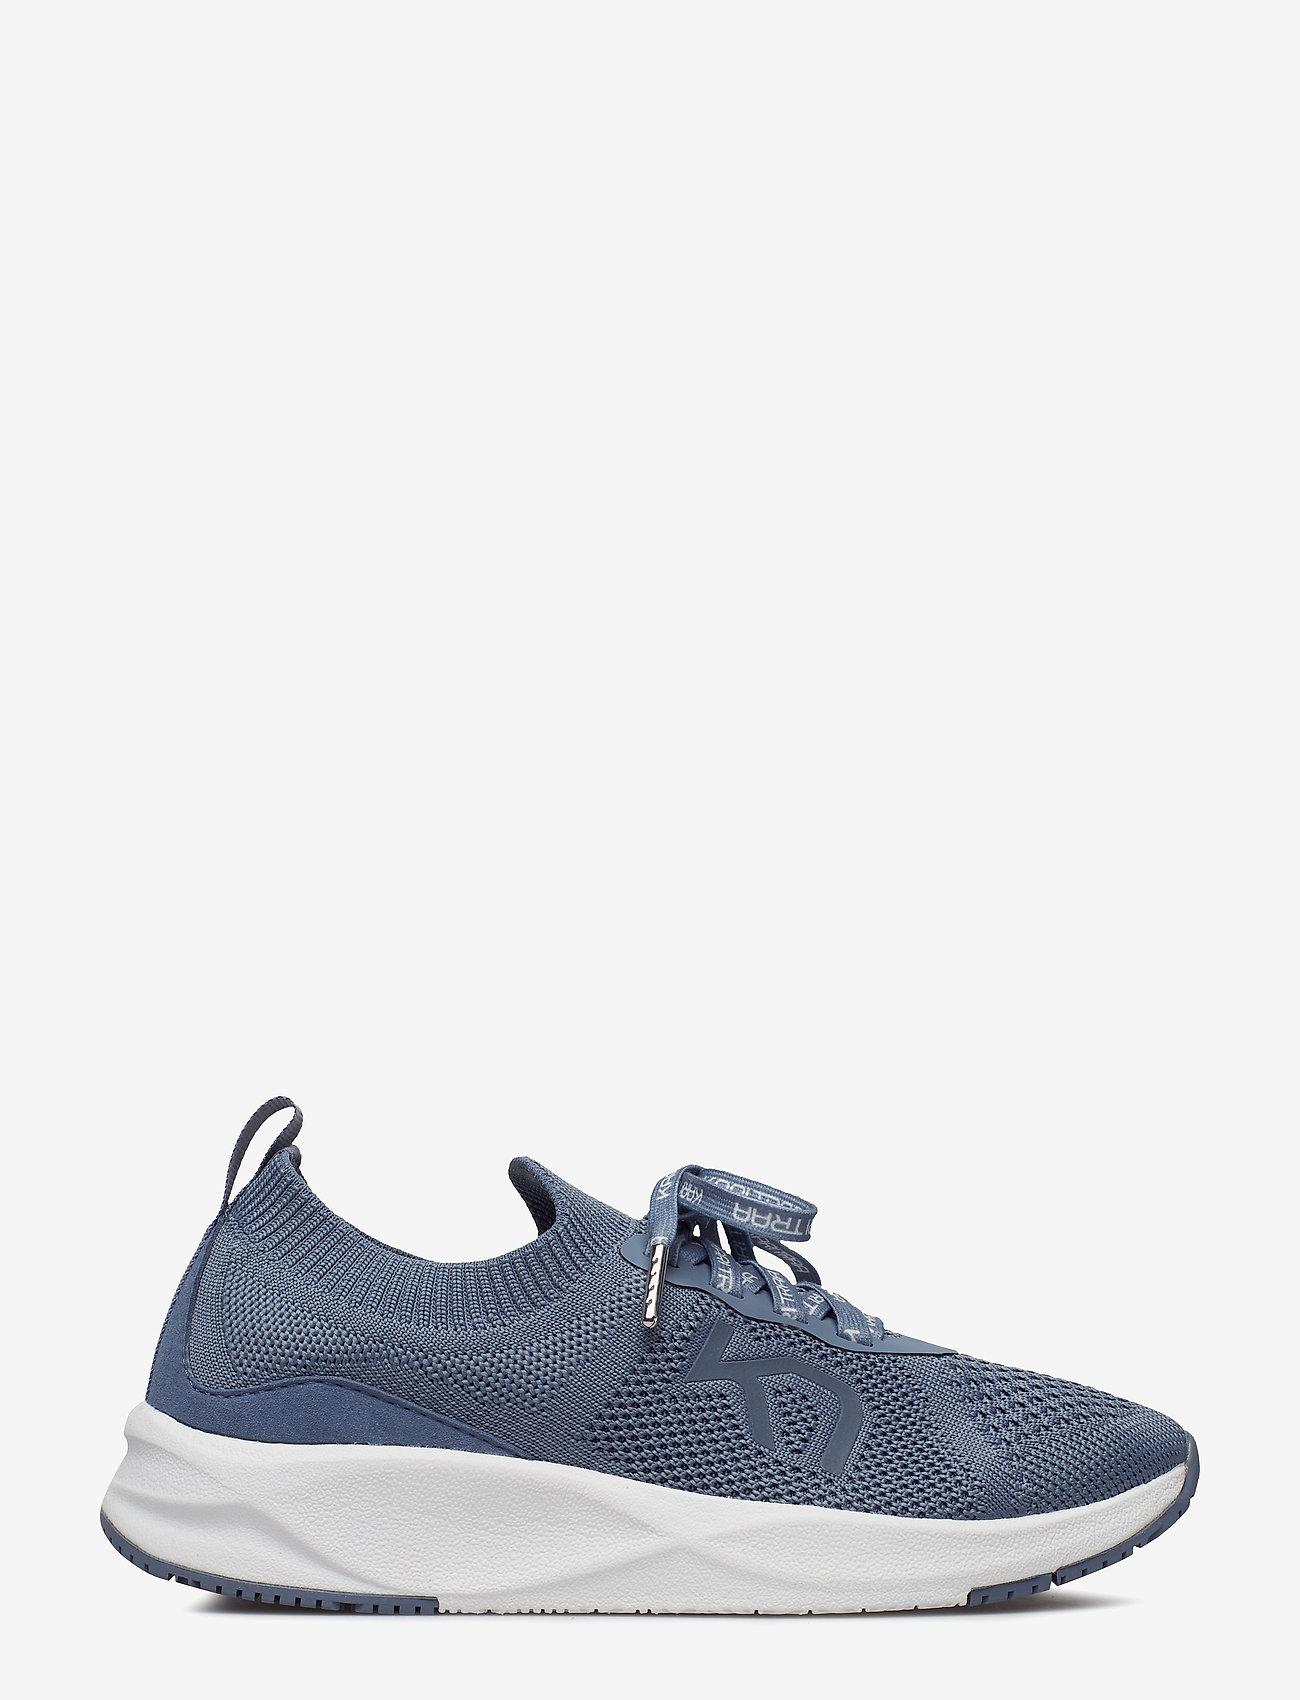 Kari Traa - BYKS - låga sneakers - jeans - 1